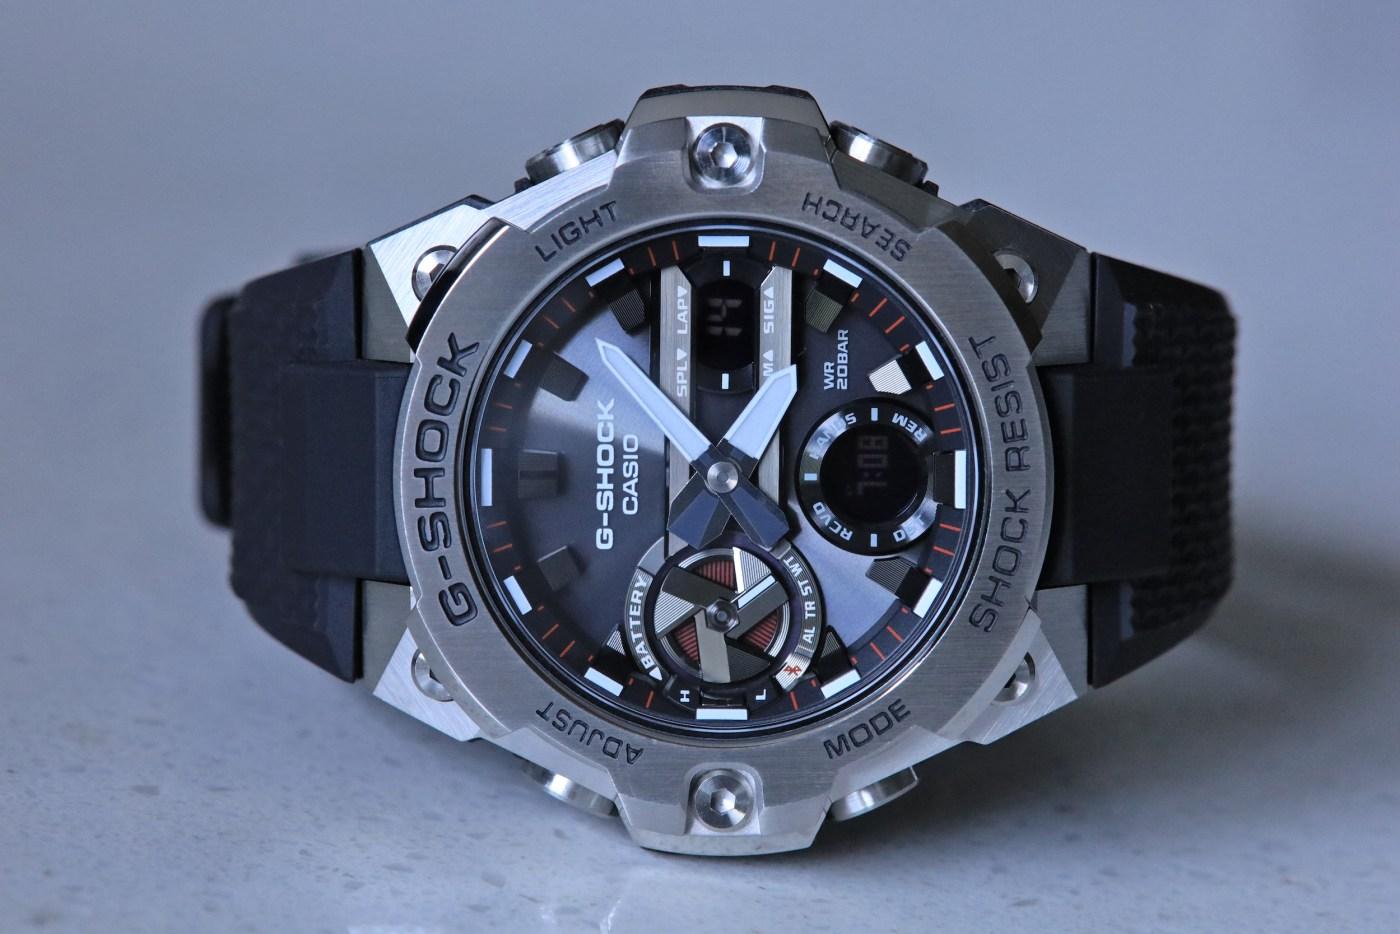 Steel G GSTB400-1A